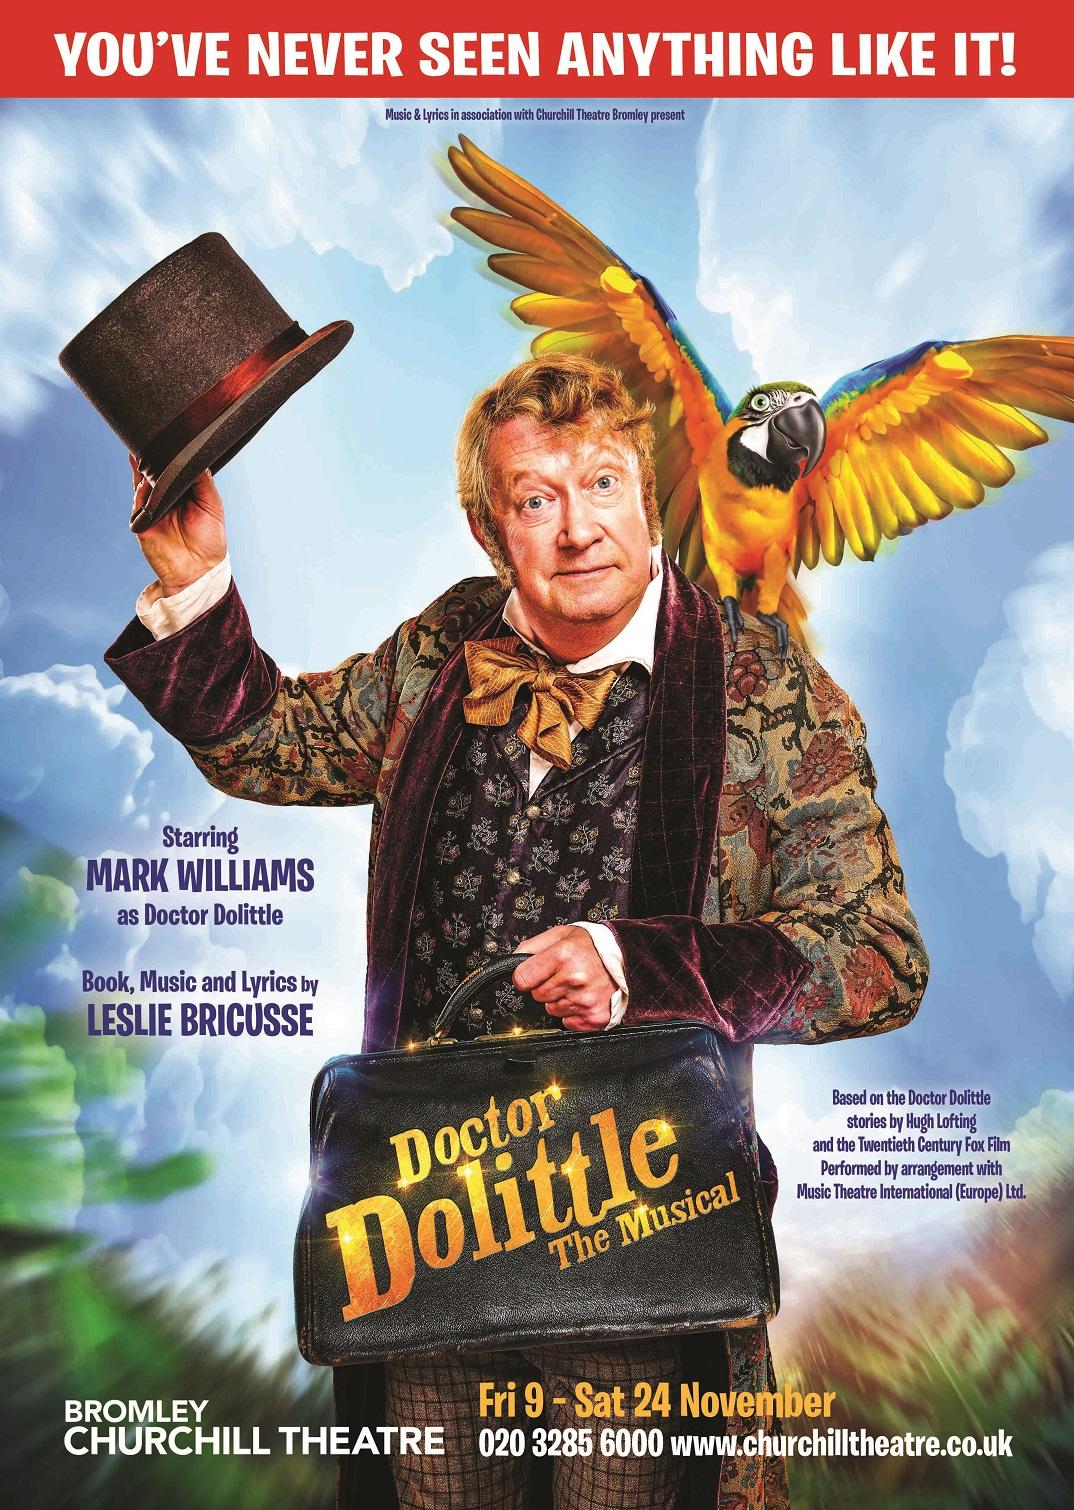 Doctor Dolittle Poster Show Image